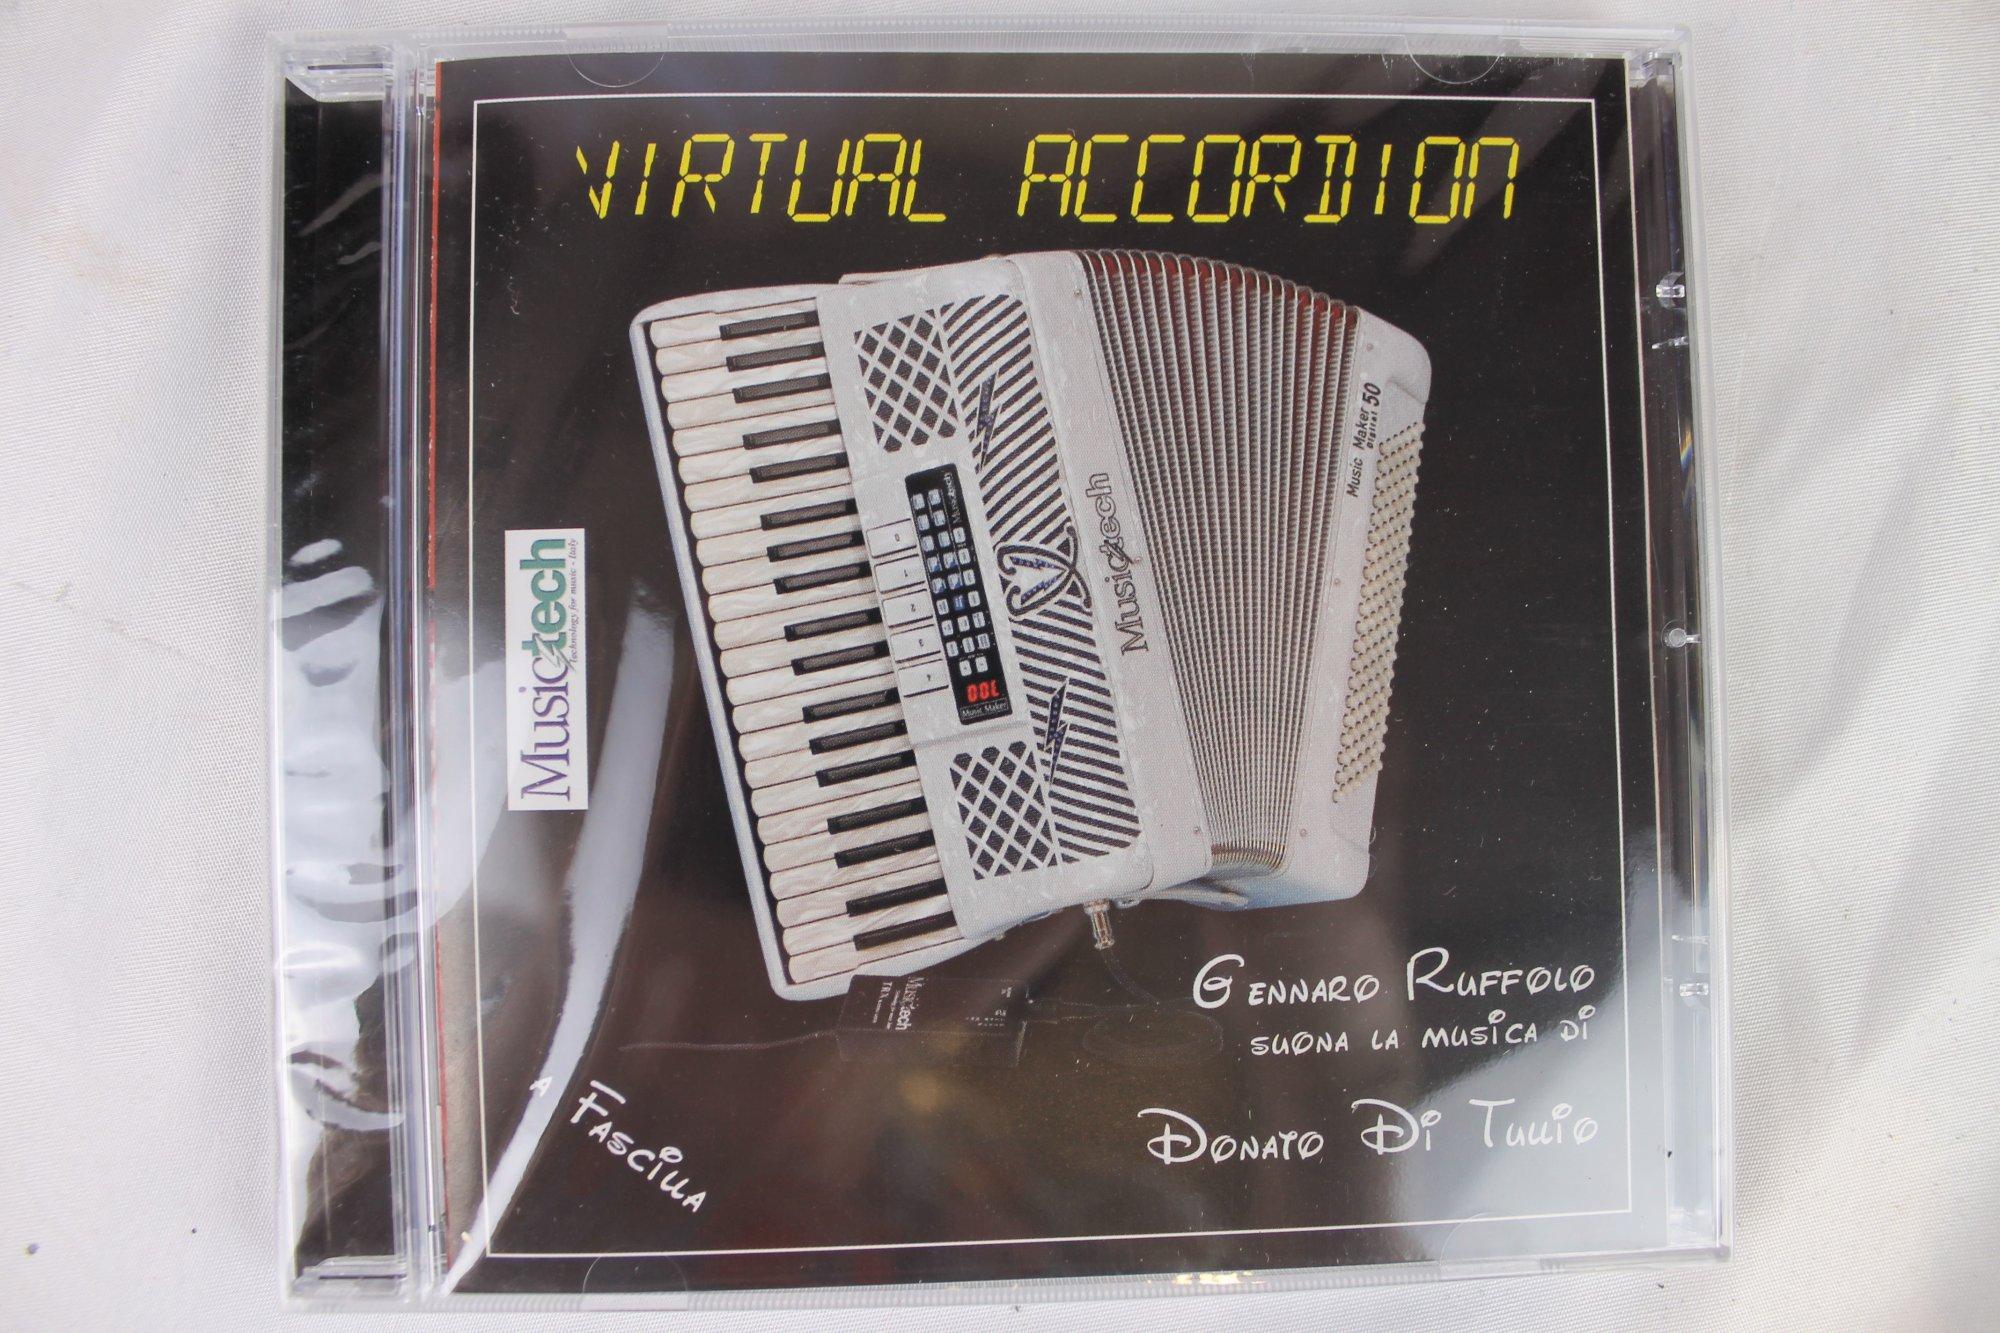 Virtual Accordion: Gennaro Ruffolo plays the music of Donato Di Tullio